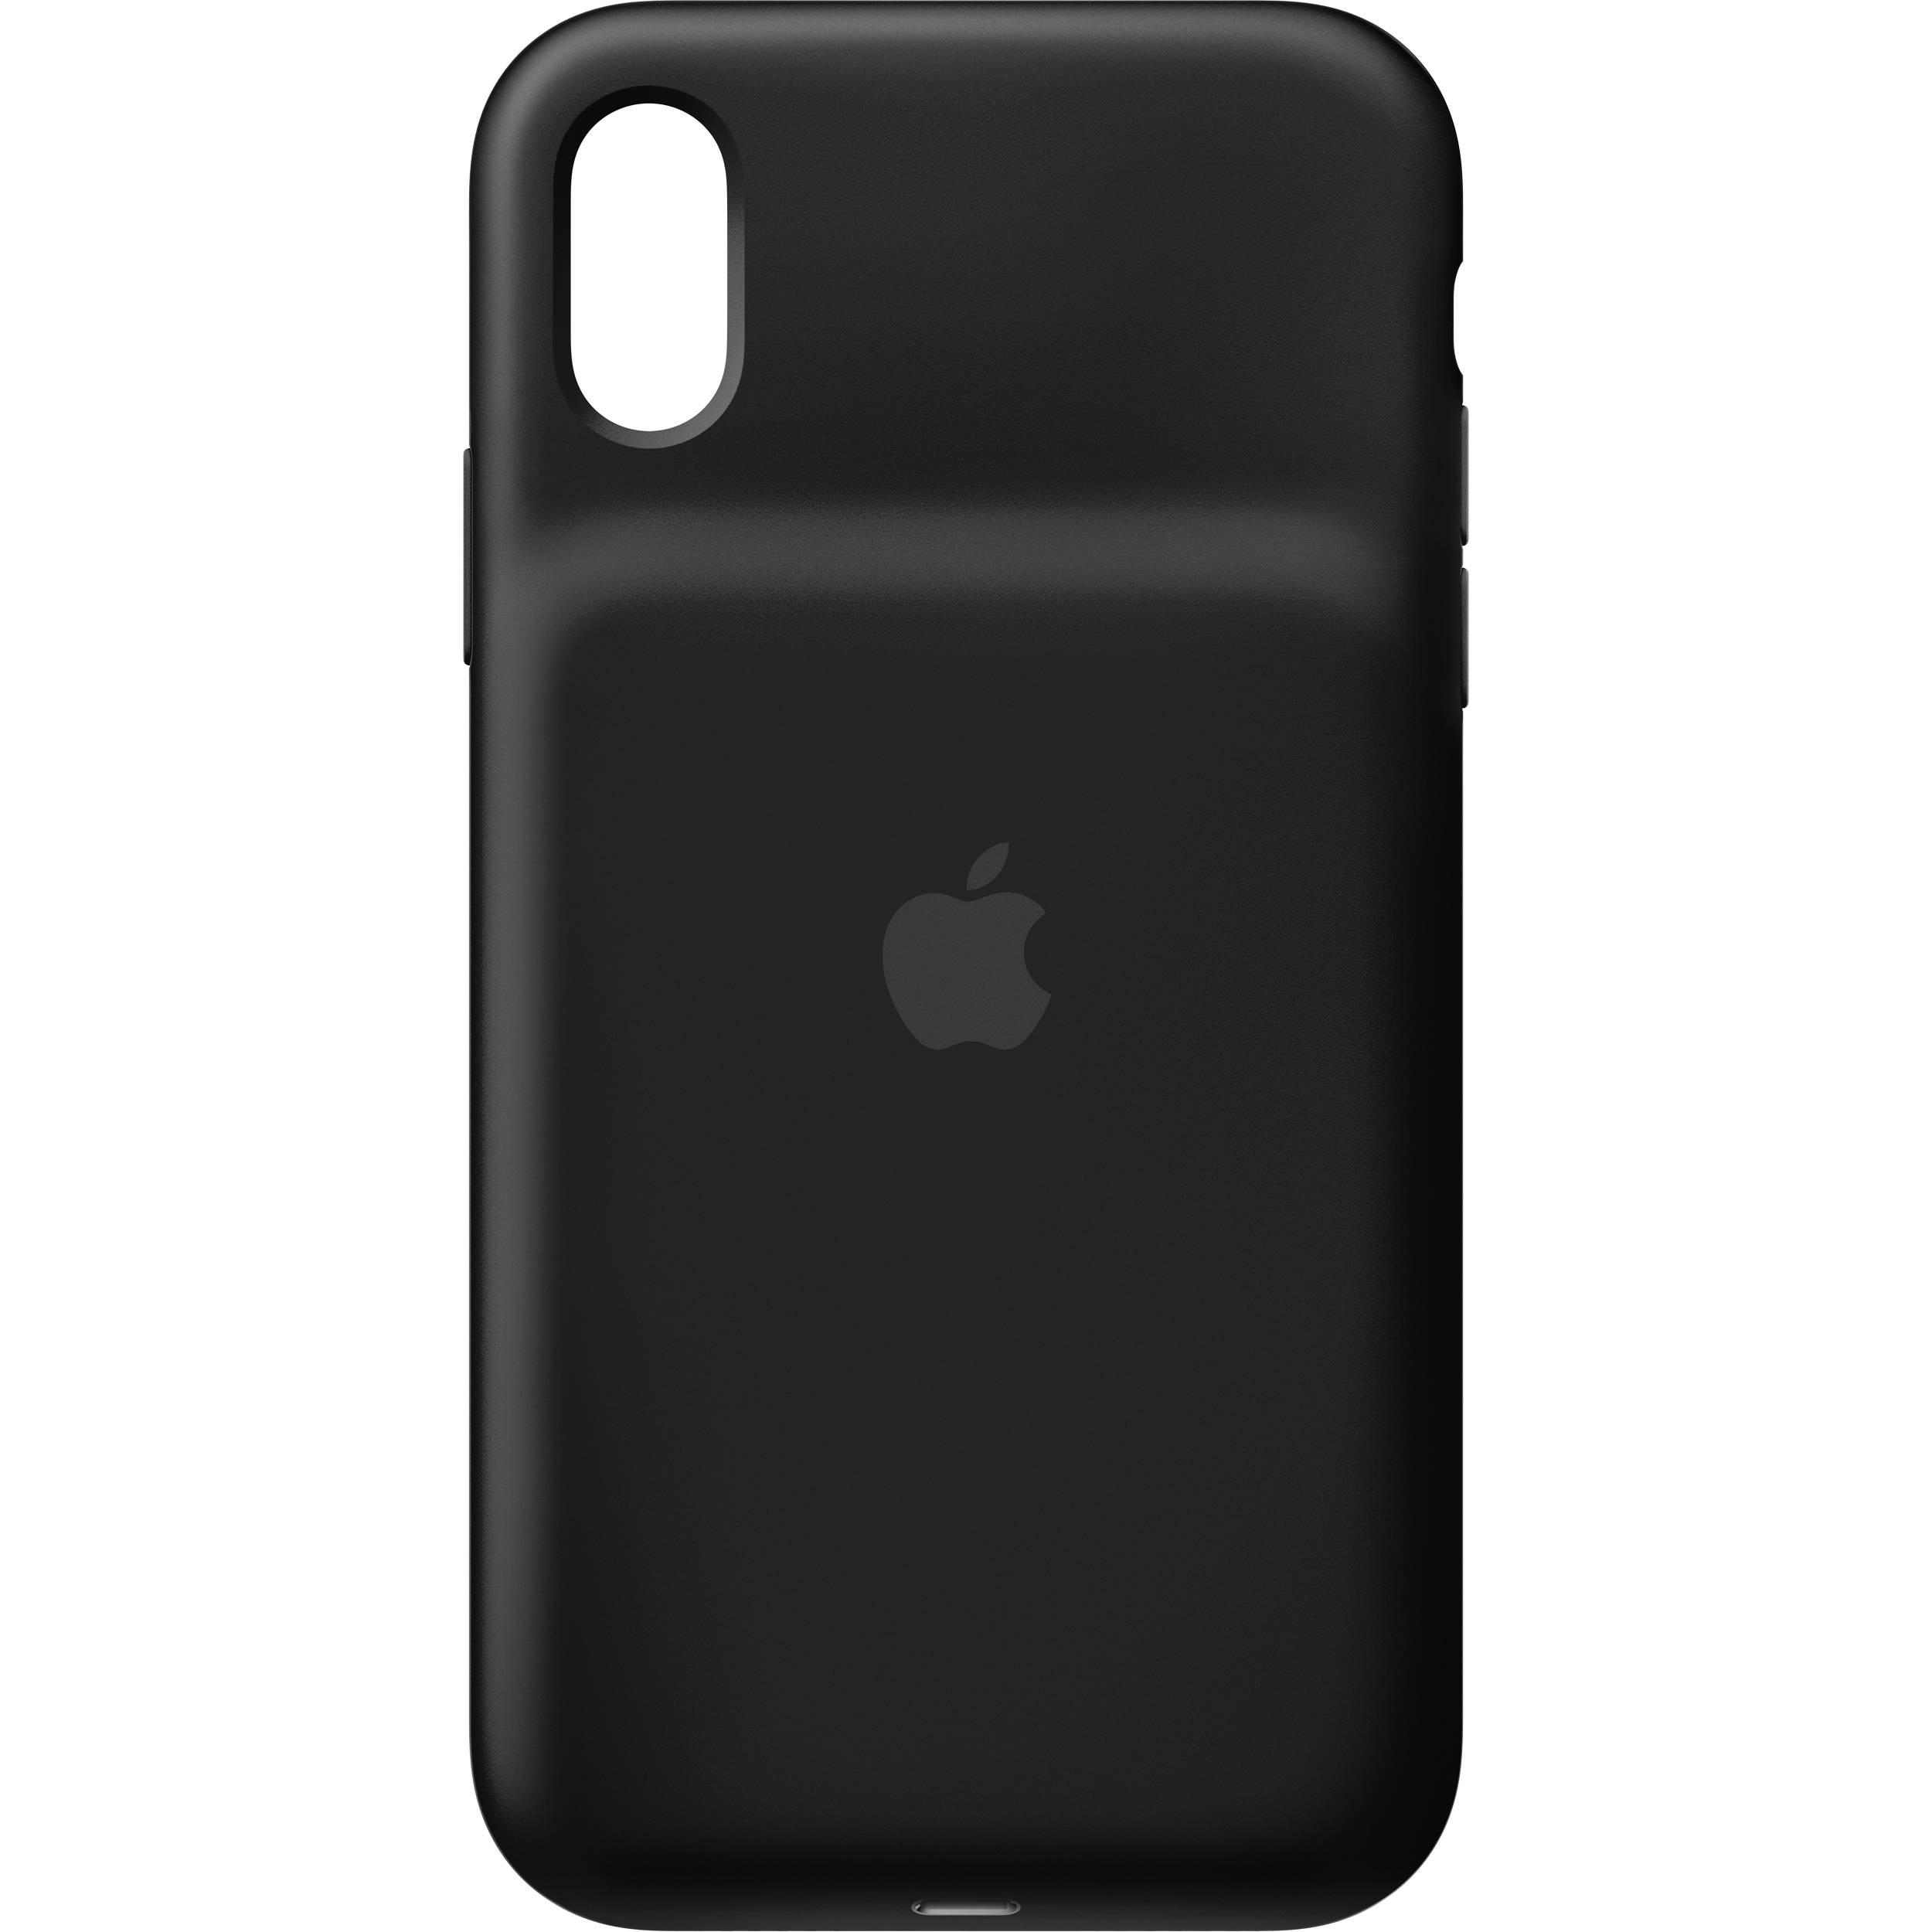 Apple Iphone Xr Smart Battery Case Black Mu7m2ll A B H Photo